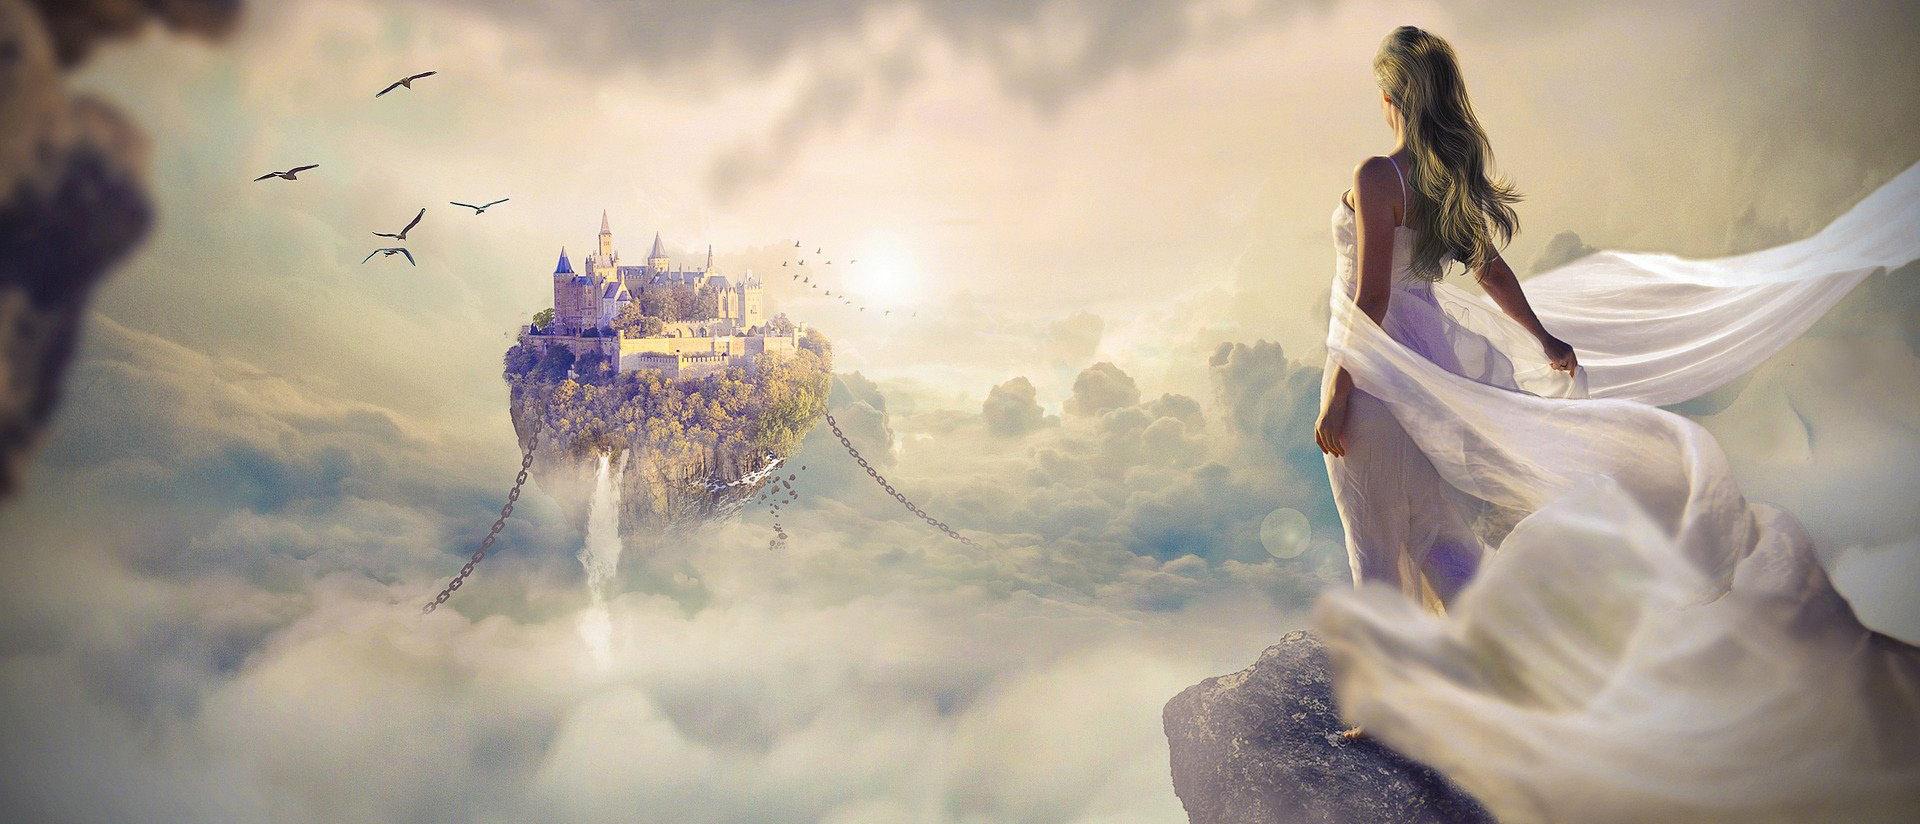 YA fantasy knihy: Trón zo skla- hodnoty, morálka, sexualita